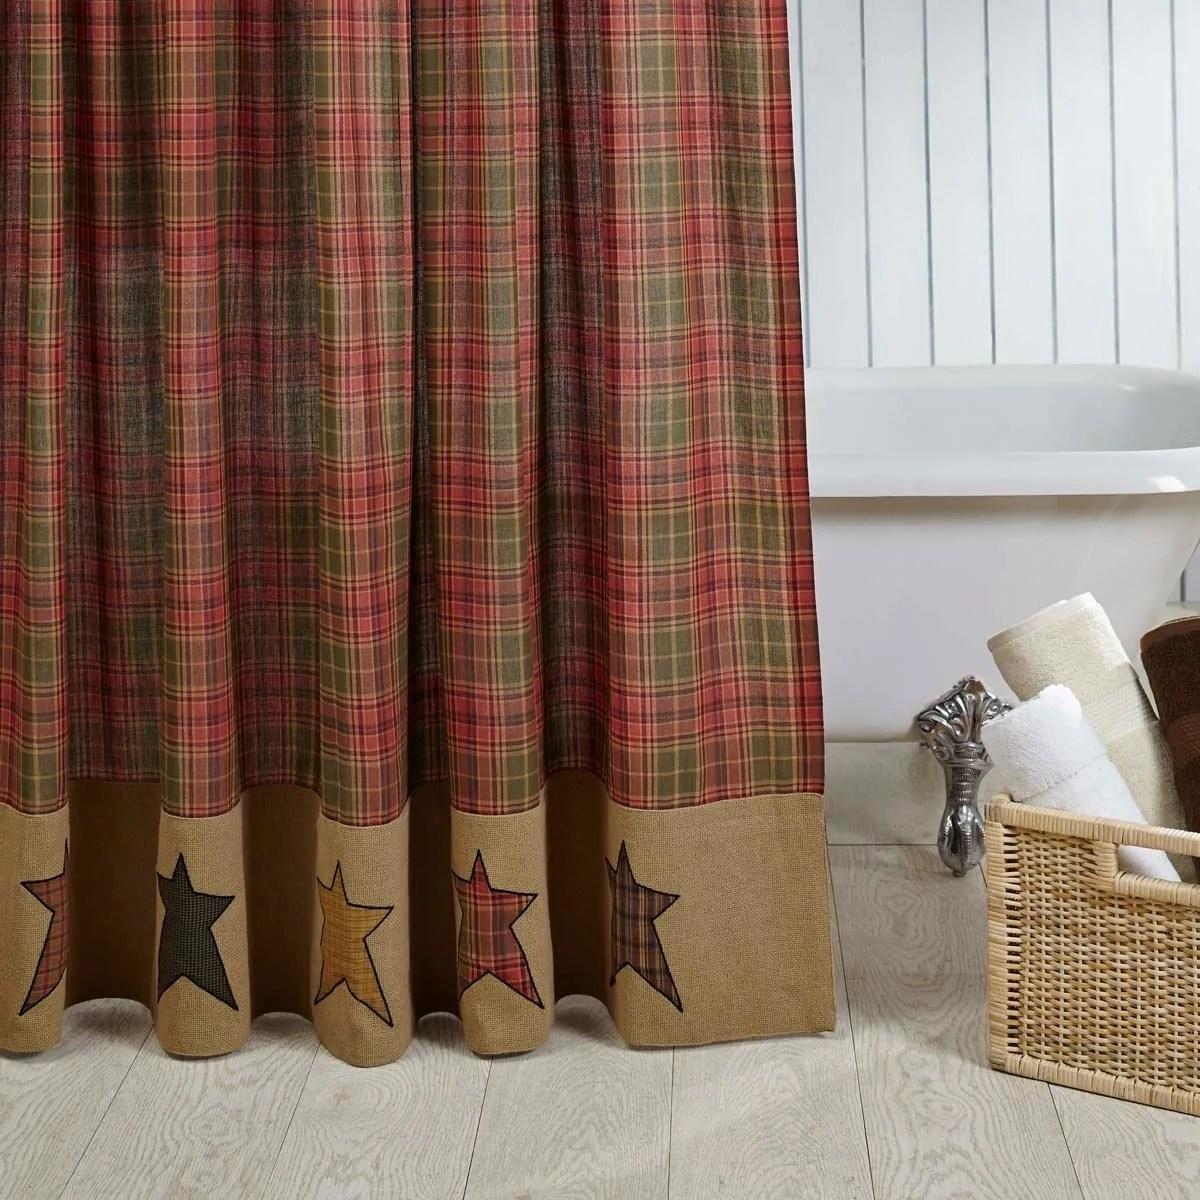 Red Primitive Bath Vhc Stratton Shower Curtain Rod Pocket Cotton Star Appliqued